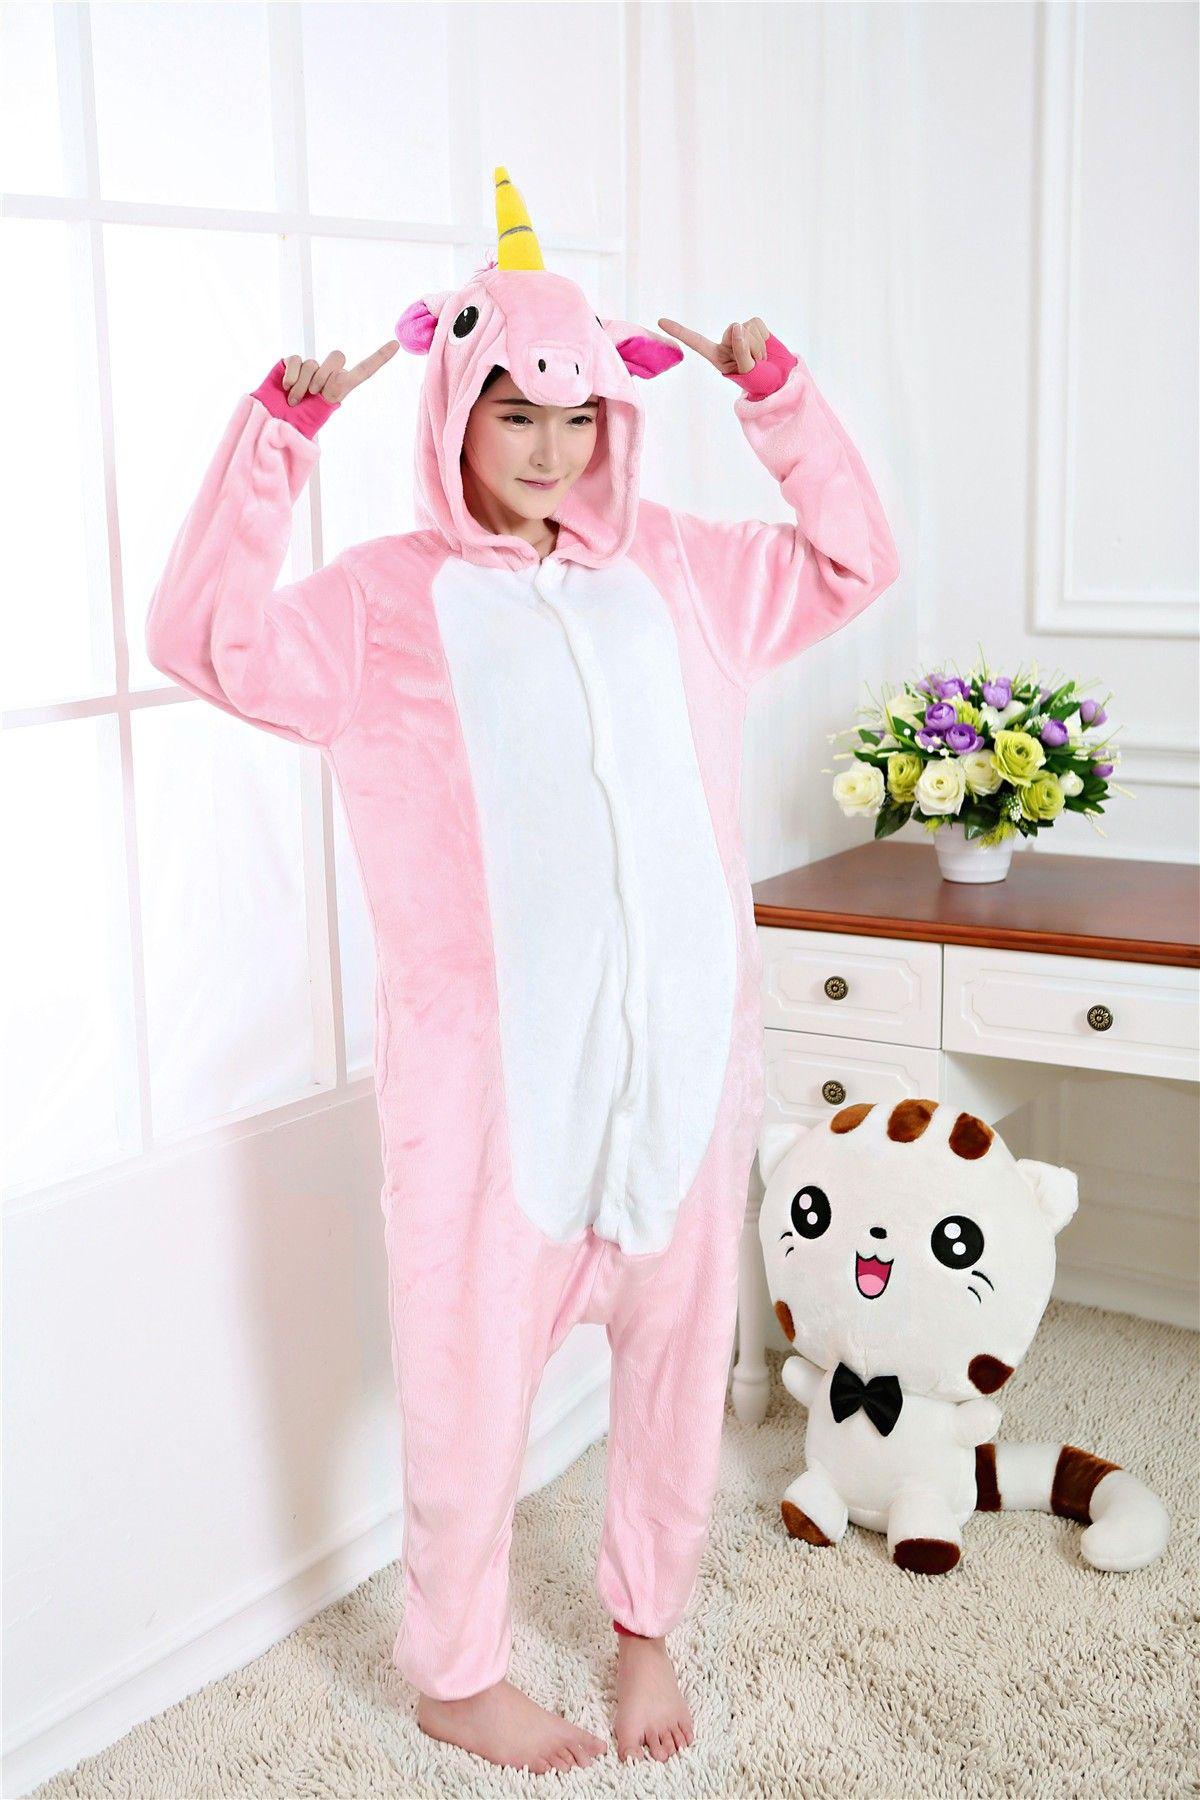 5f26510e3 kigurumi pink Pegasus onesies animal pajamas for adults